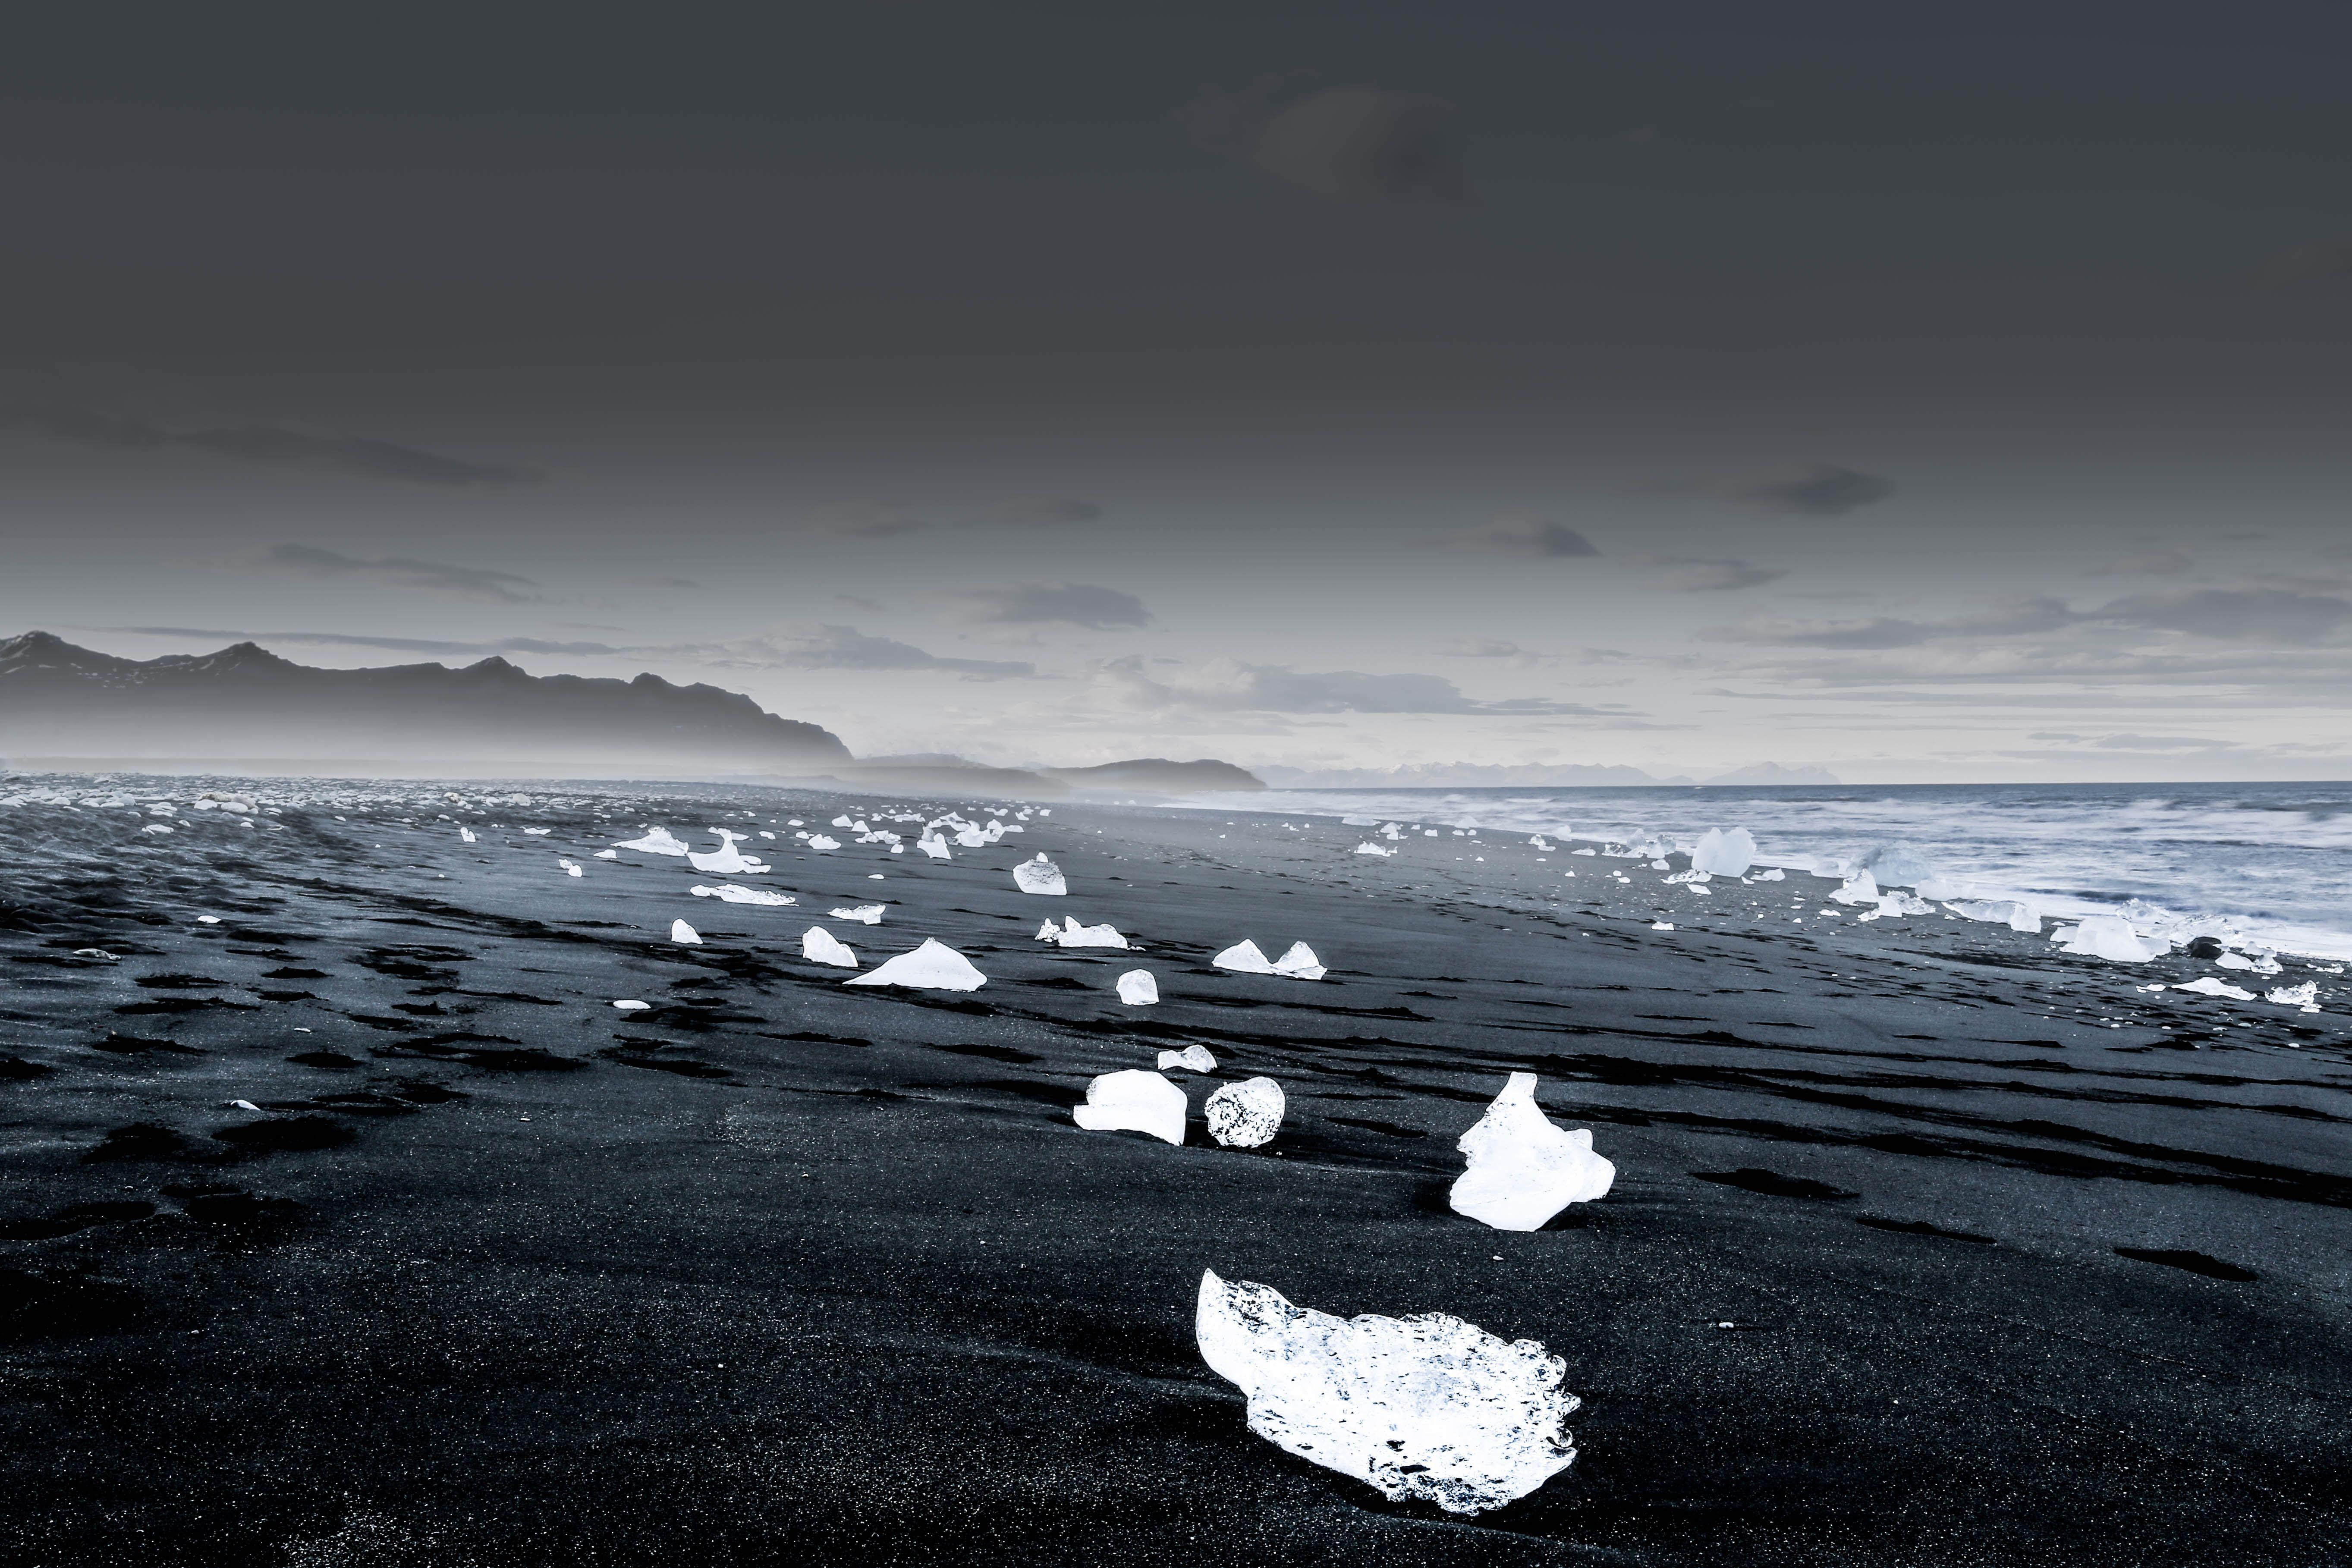 Landscape Photography Of Icebergs Iceland Landscape Desktop Background Images Landscape Photography